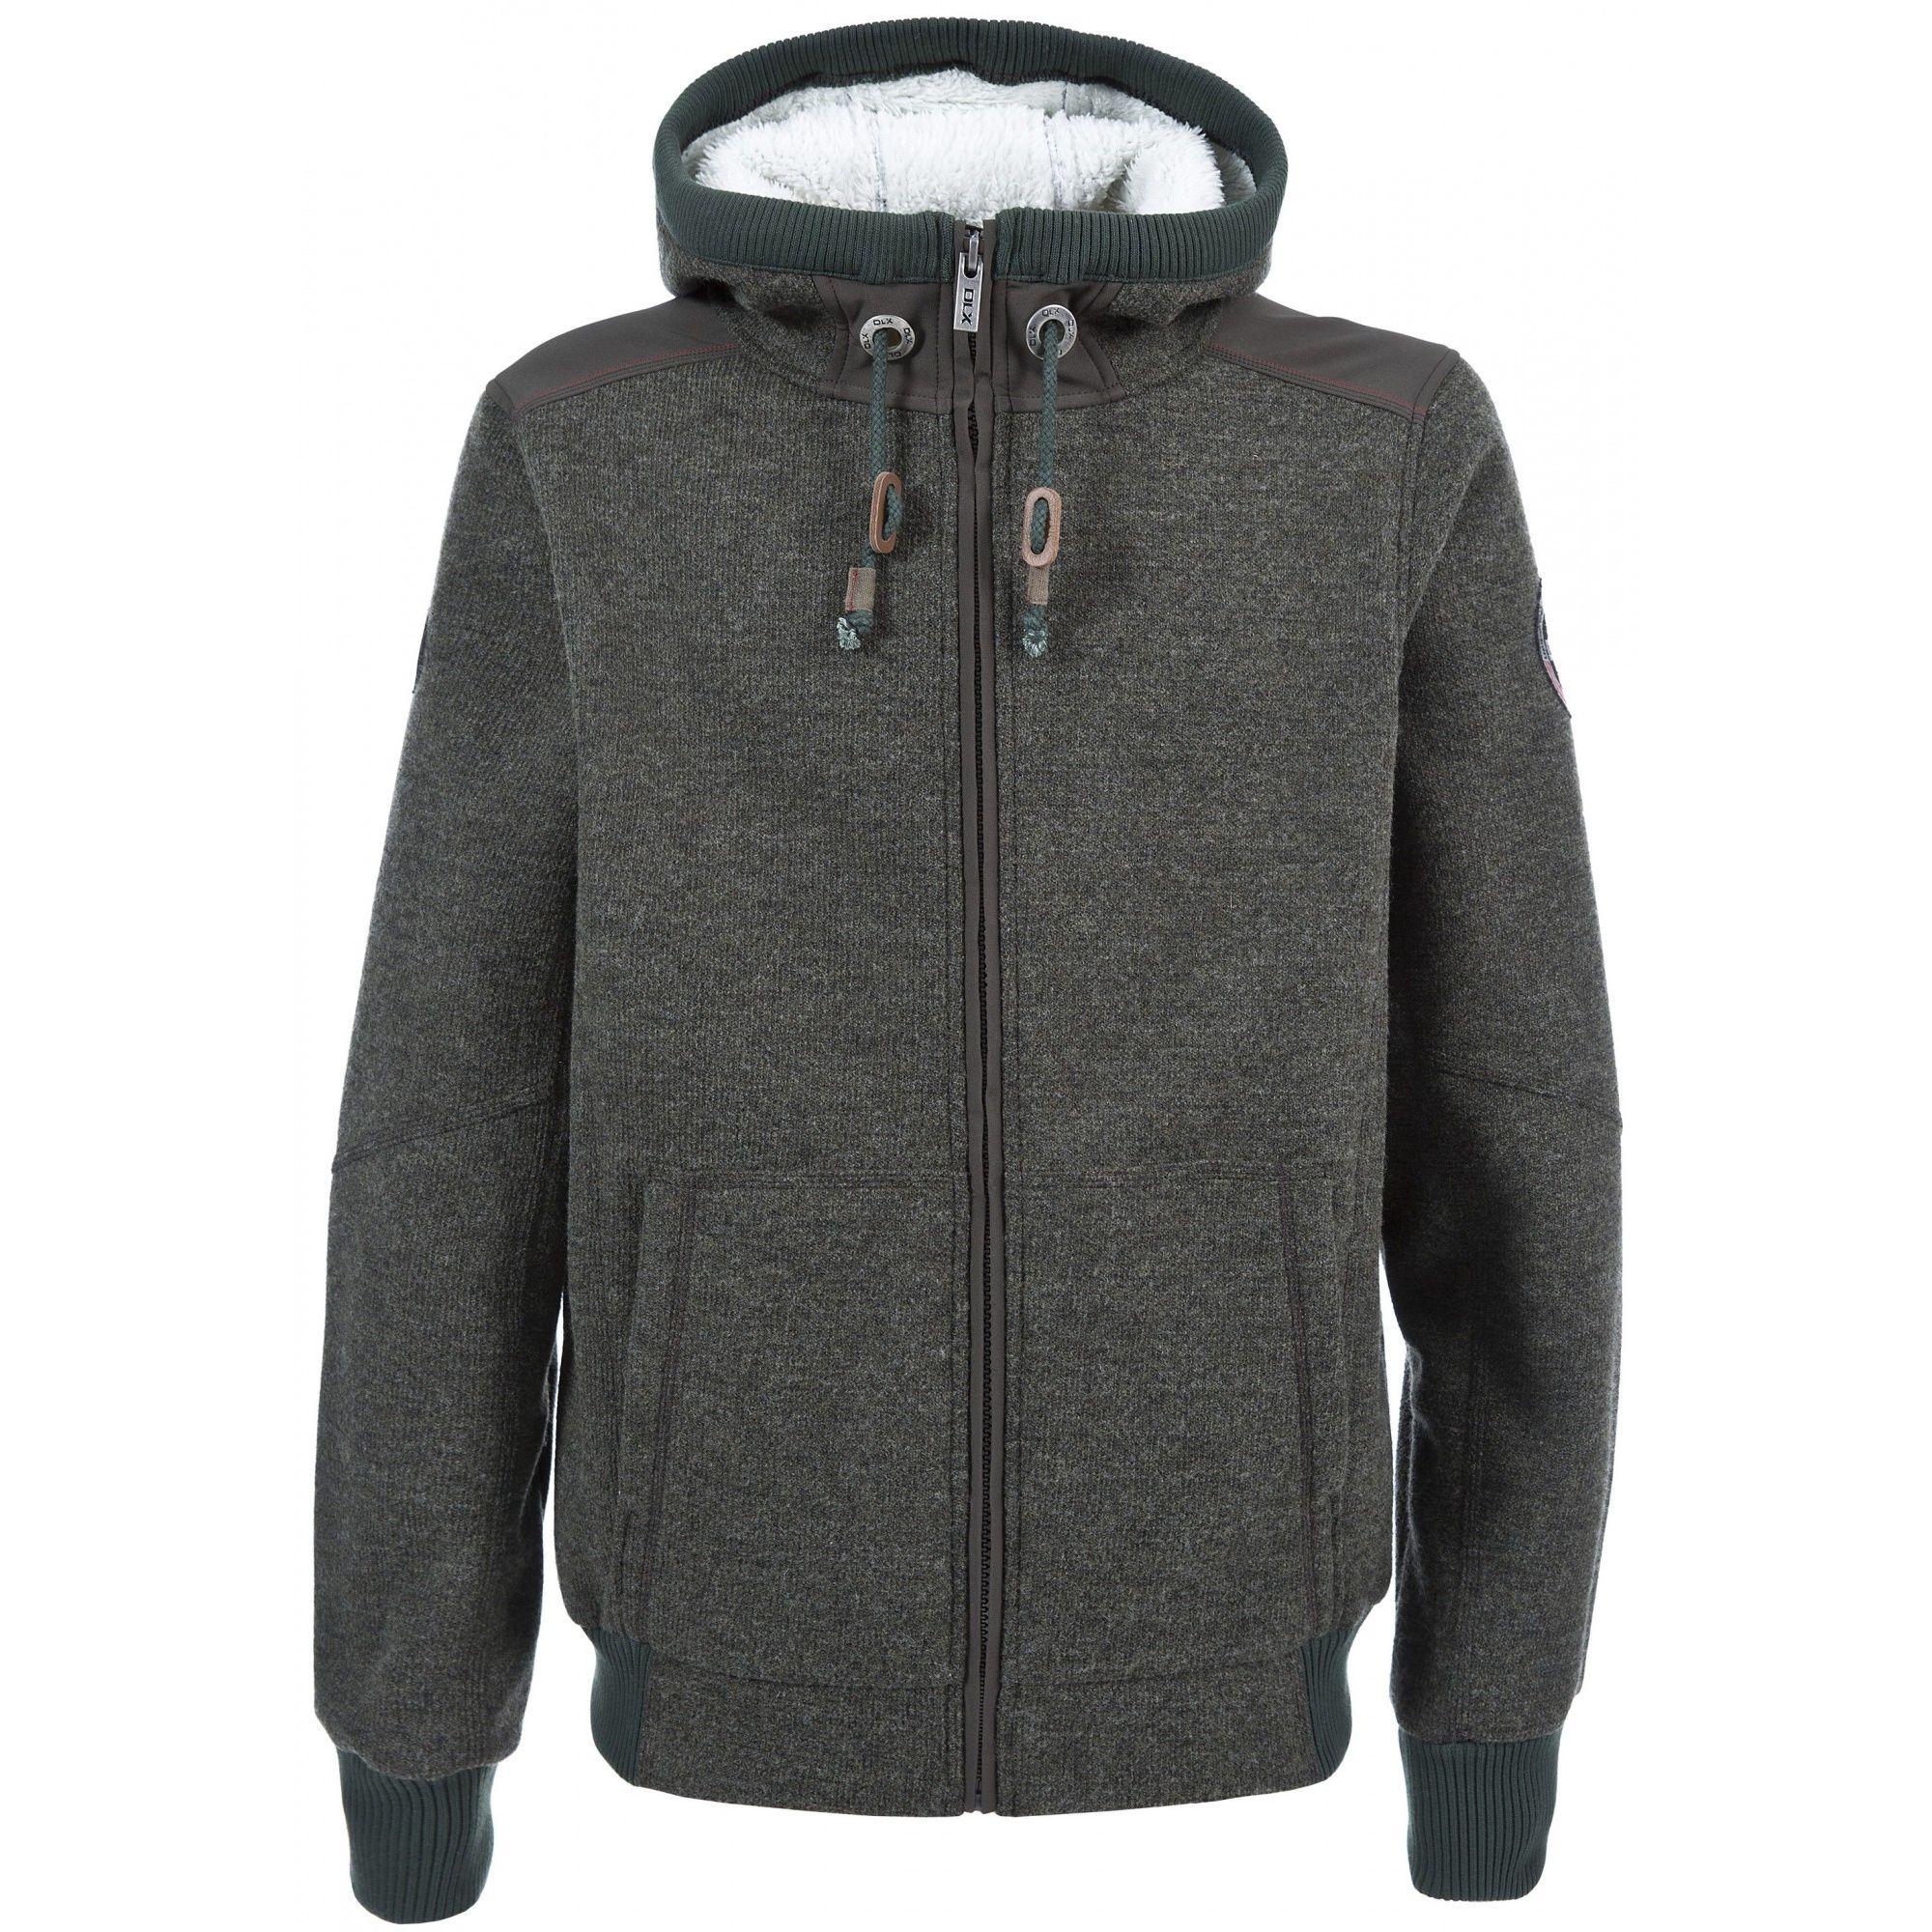 Trespass Mens Mathis Full Zip Knitted Fleece Jacket